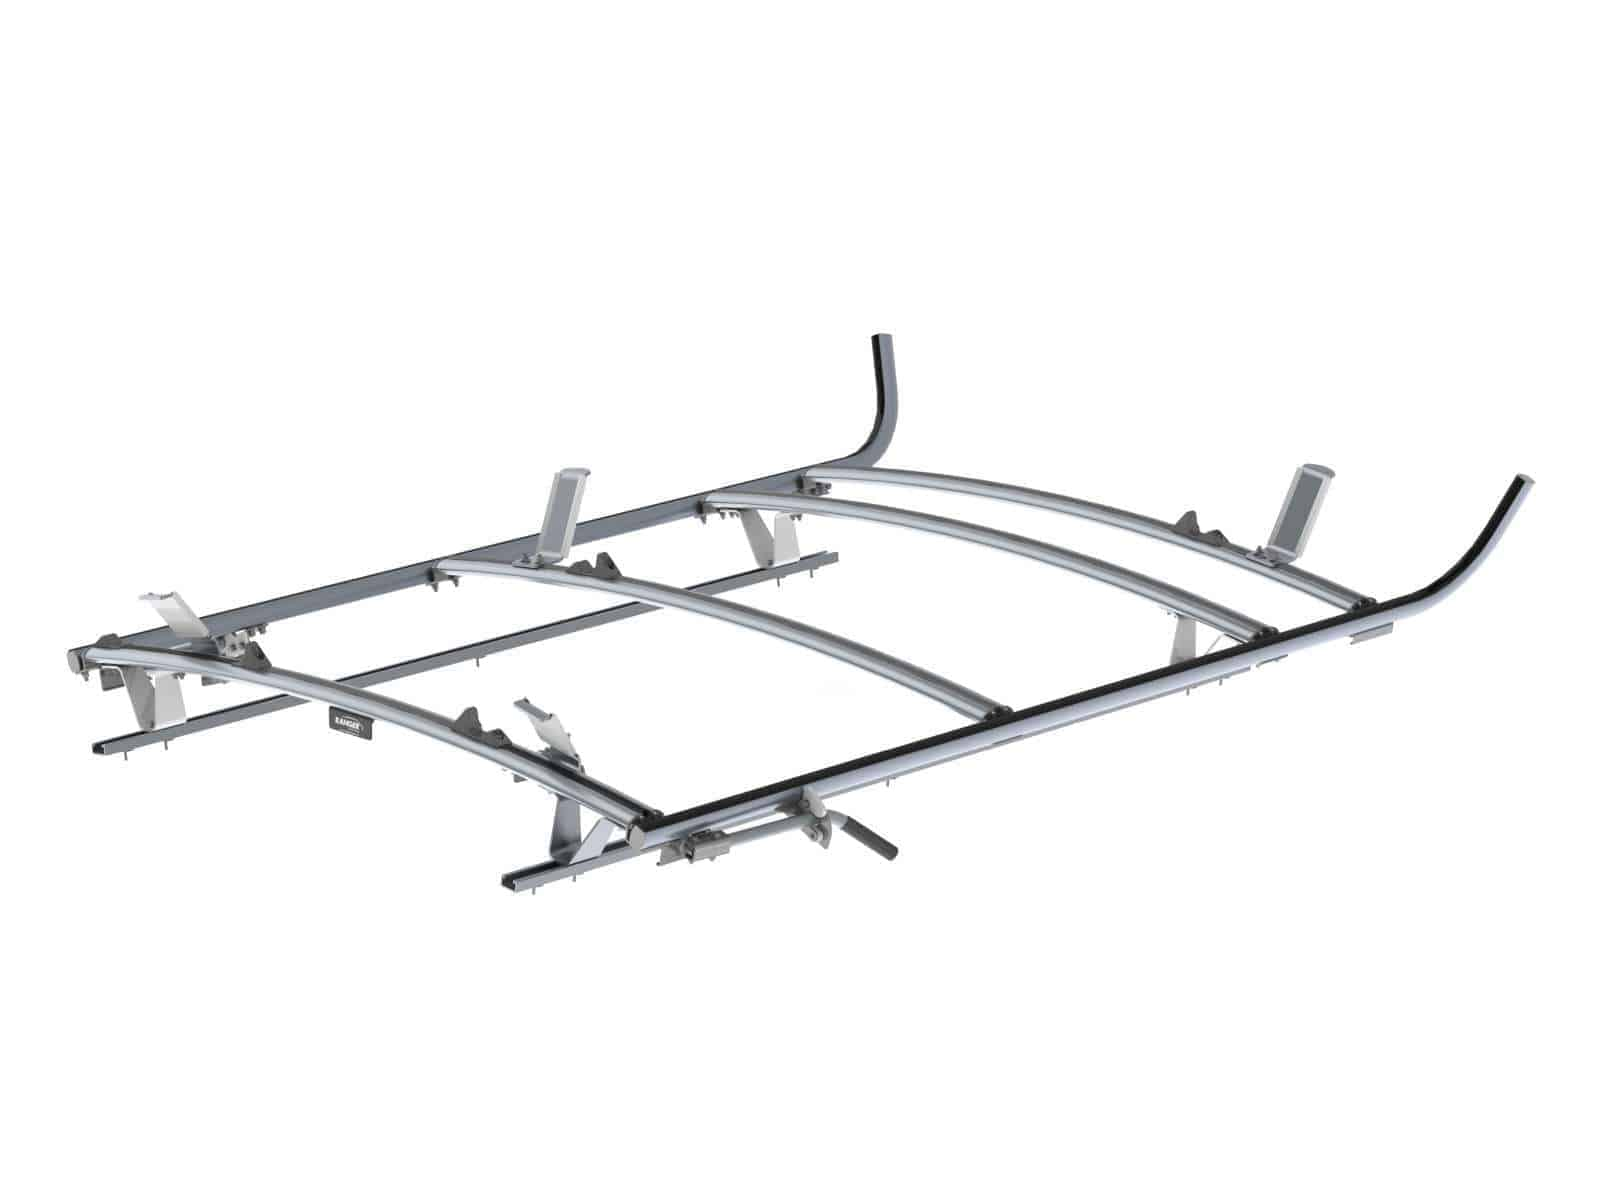 Combination Ram ProMaster City Ladder Rack, 3 Bar System